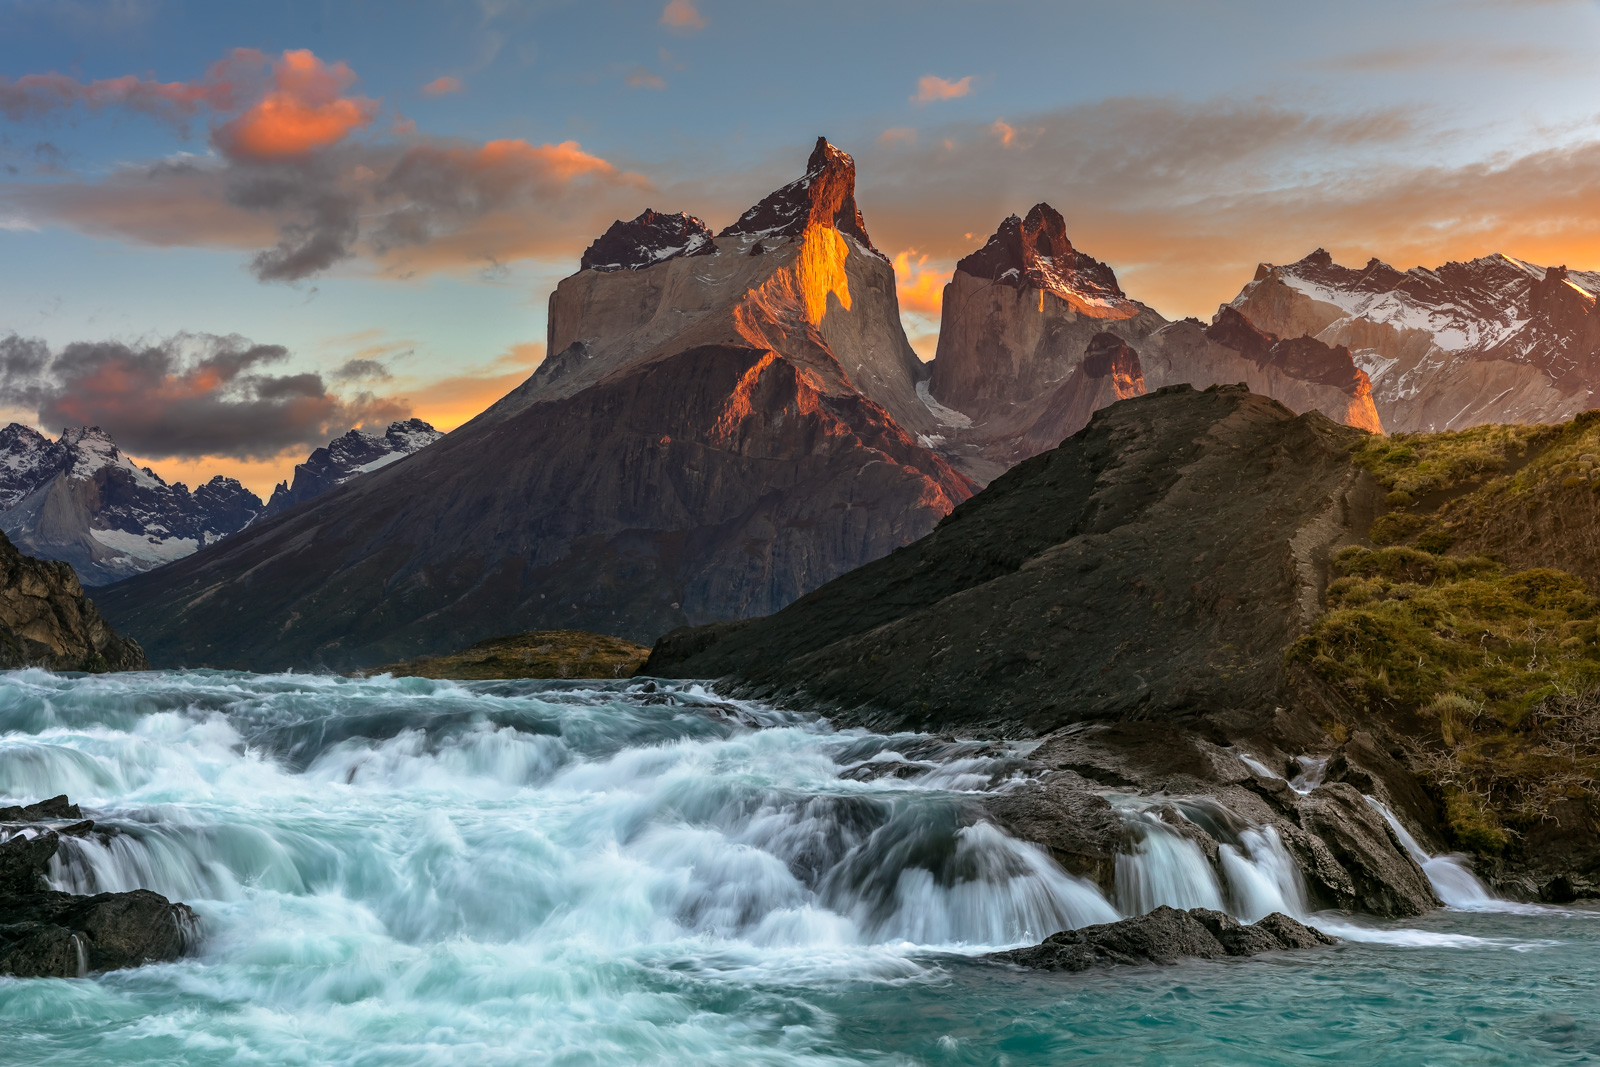 Chile, Patagonia, Torres del Paine, Sunrsie, Mountains, River, limited edition, photograph, fine art, landscape, photo